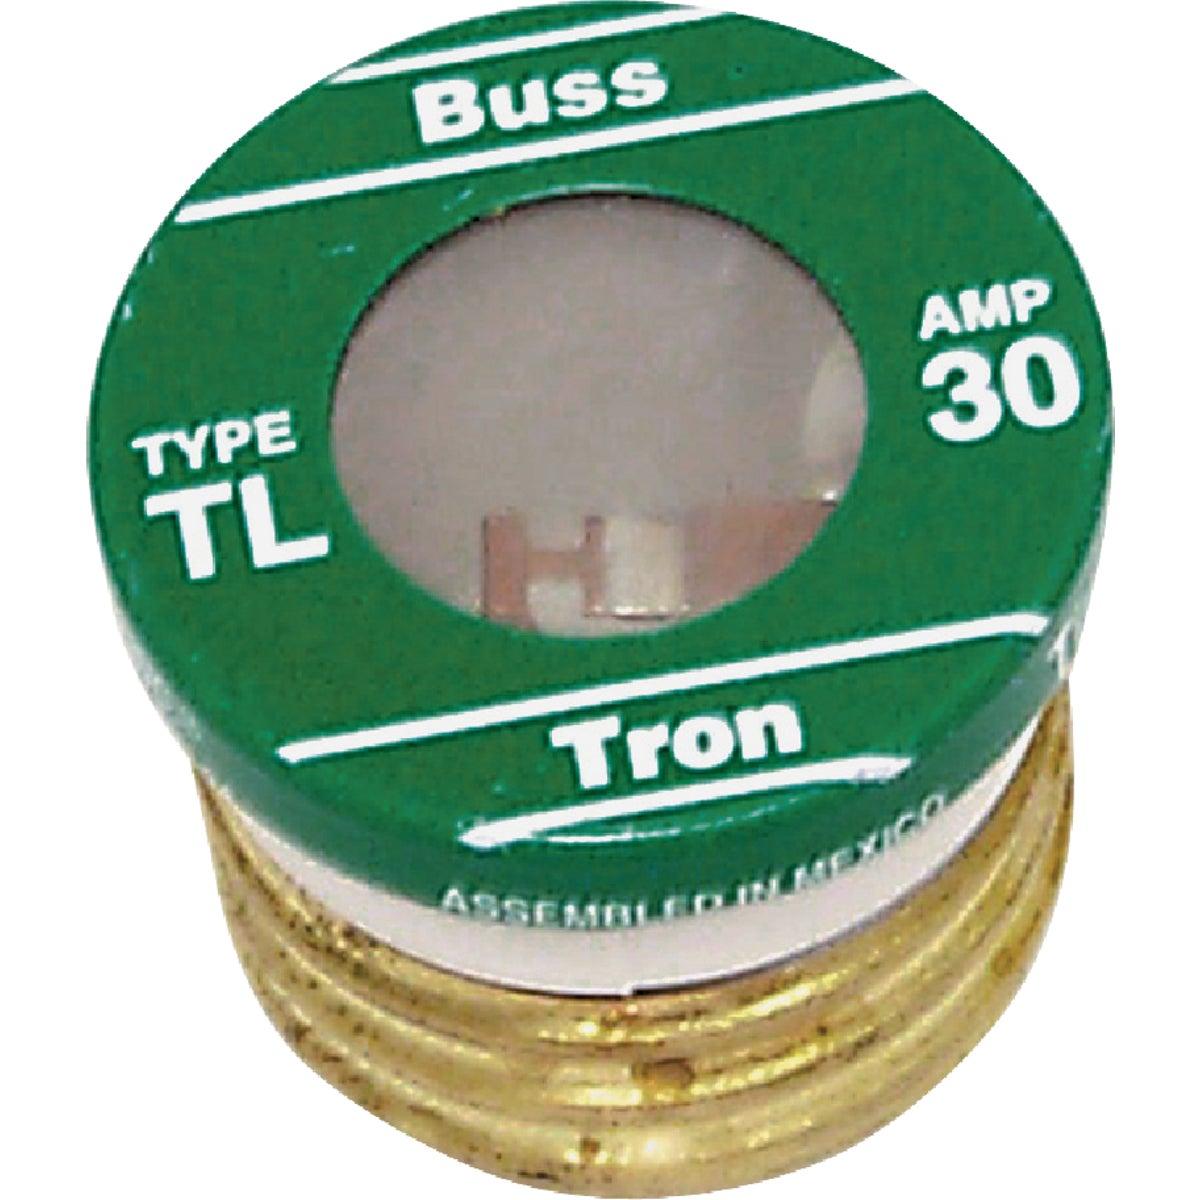 30A PLUG FUSE - BP/TL-30 by Bussmann Cooper